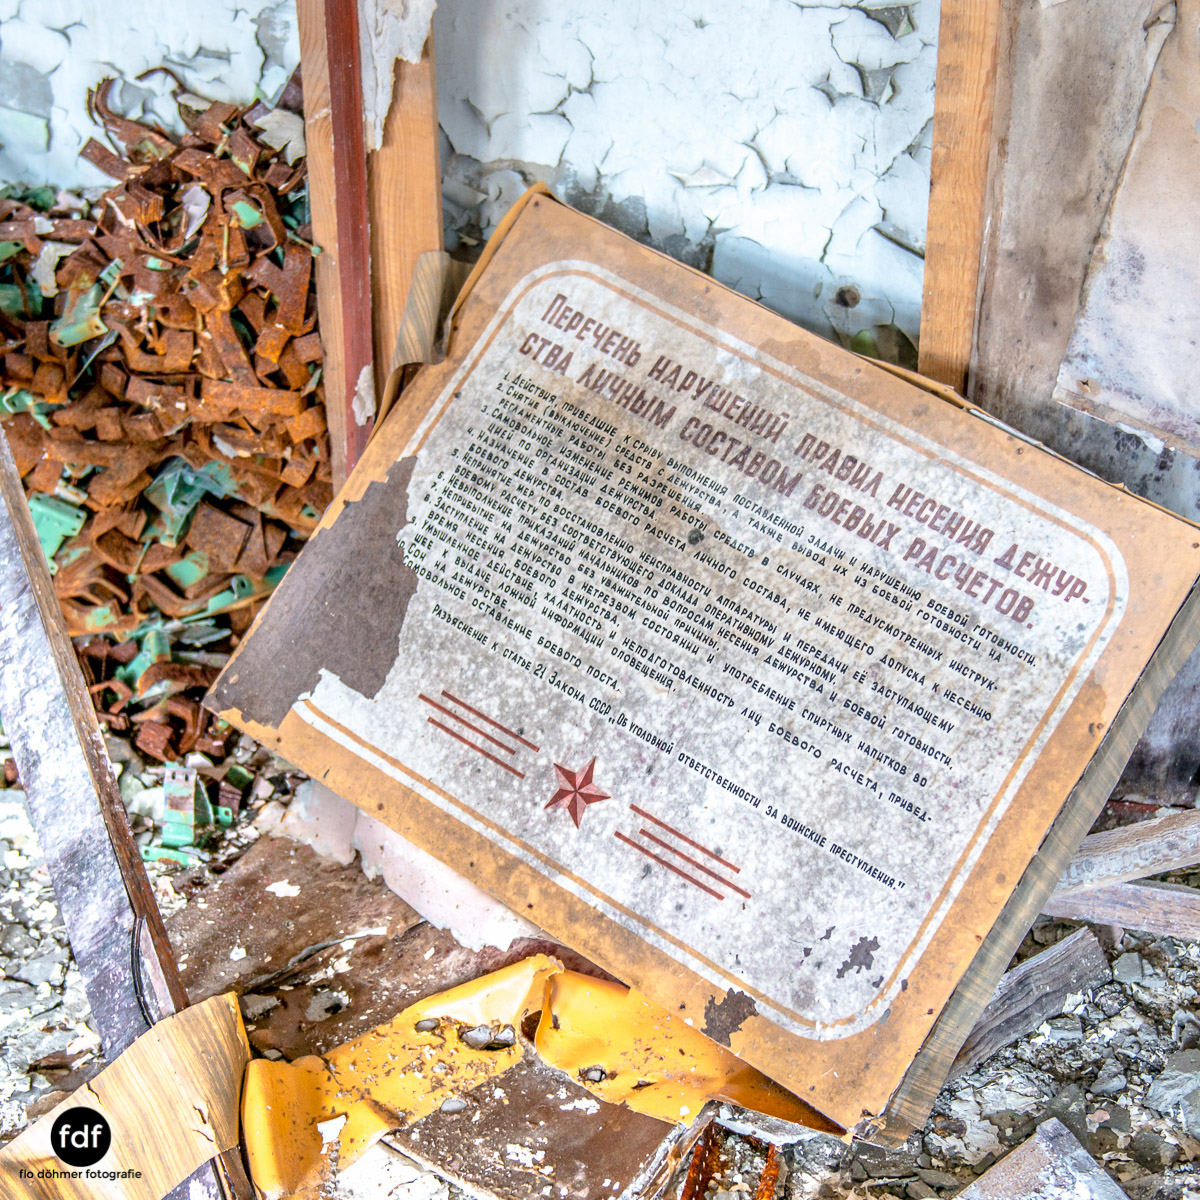 Tschernobyl-Chernobyl-Prypjat-Urbex-Lost-Place-Duga-Kontrolle-Propaganda-4.jpg